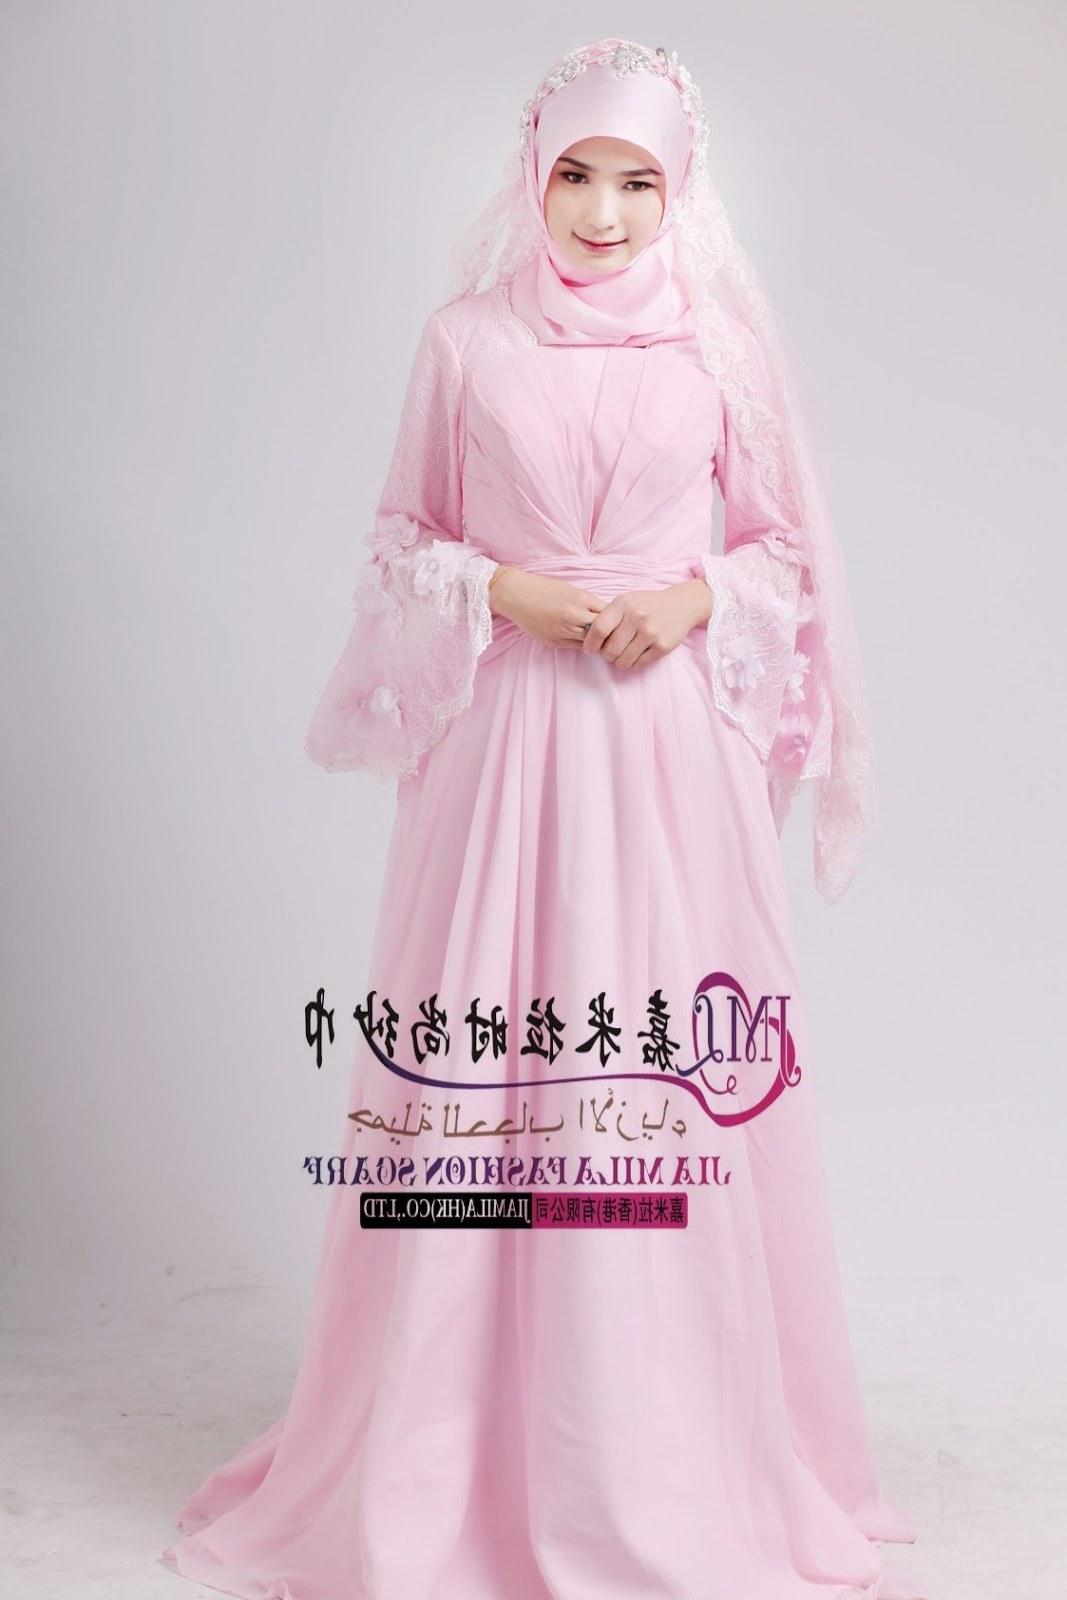 Design Foto Gaun Pengantin Muslimah Dddy Contoh Desain Baju Pengantin Muslimah Desain Pernikahan